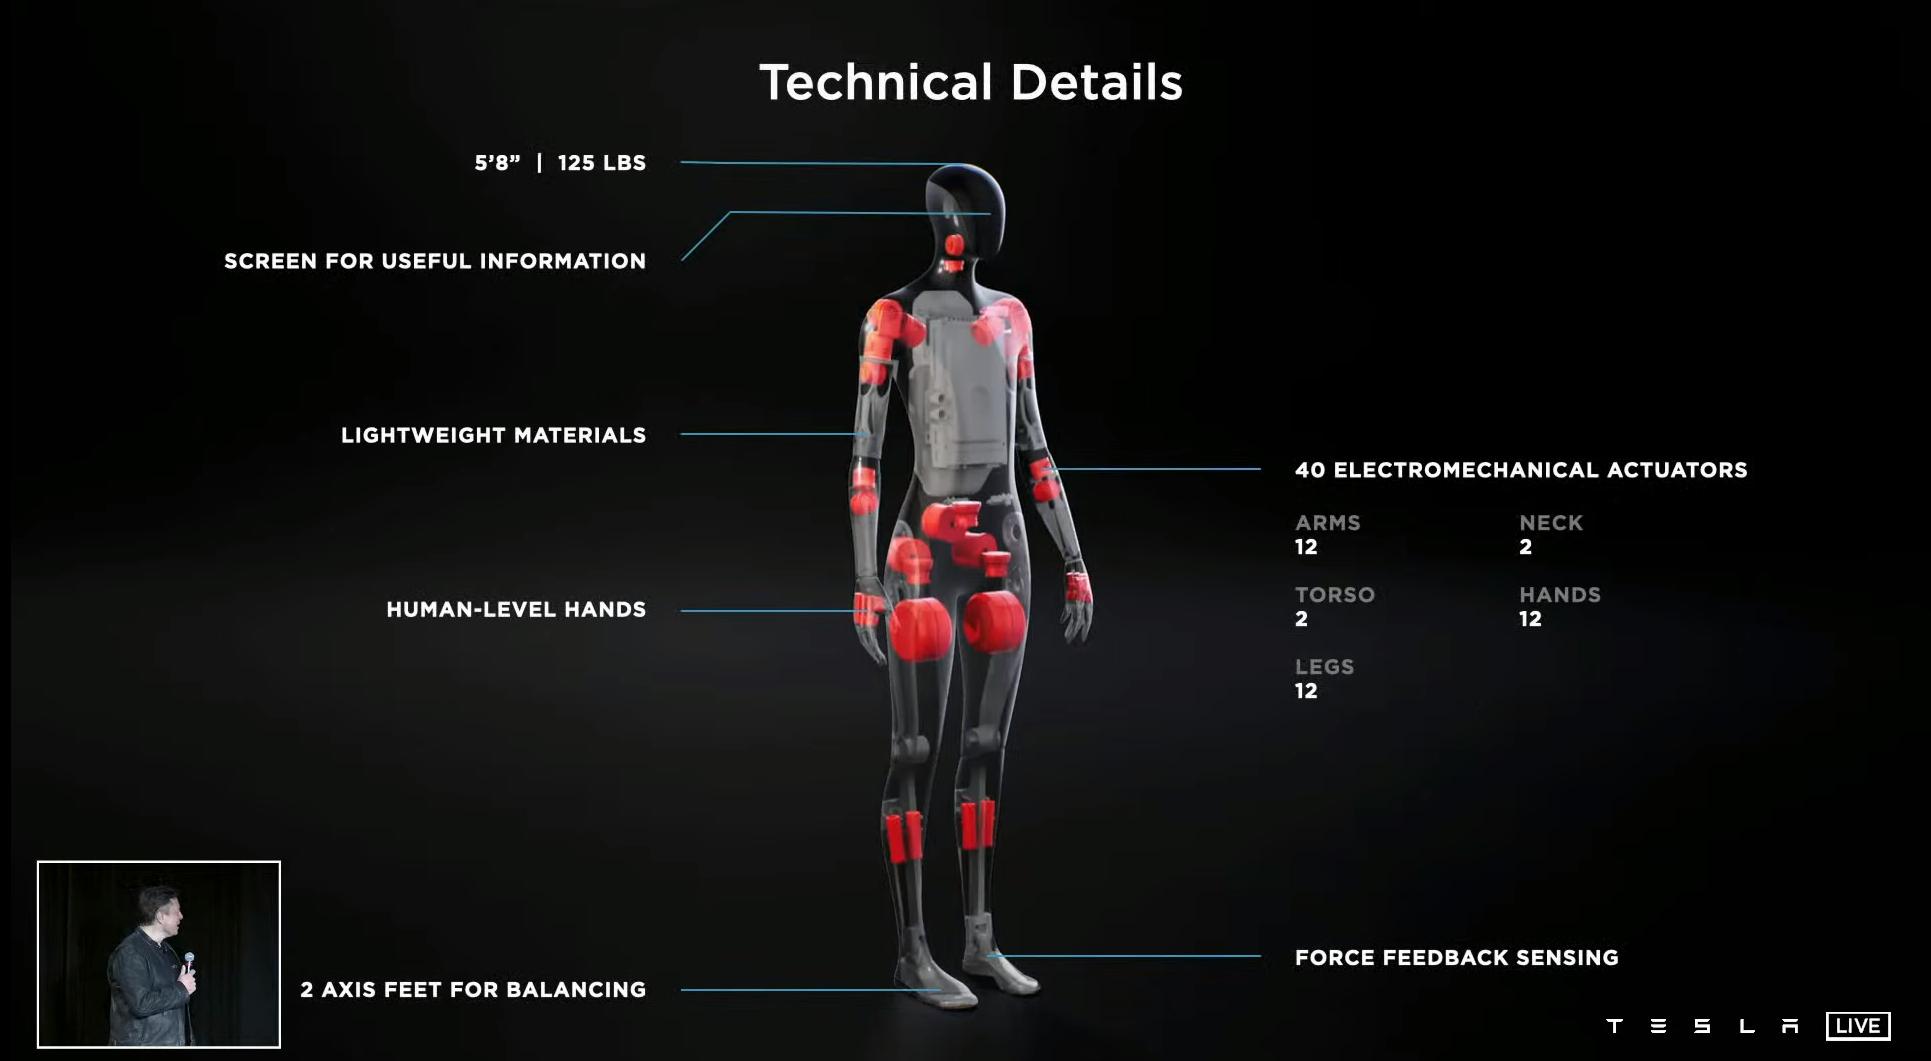 Tesla Bot features 40 electromechanical actuators.